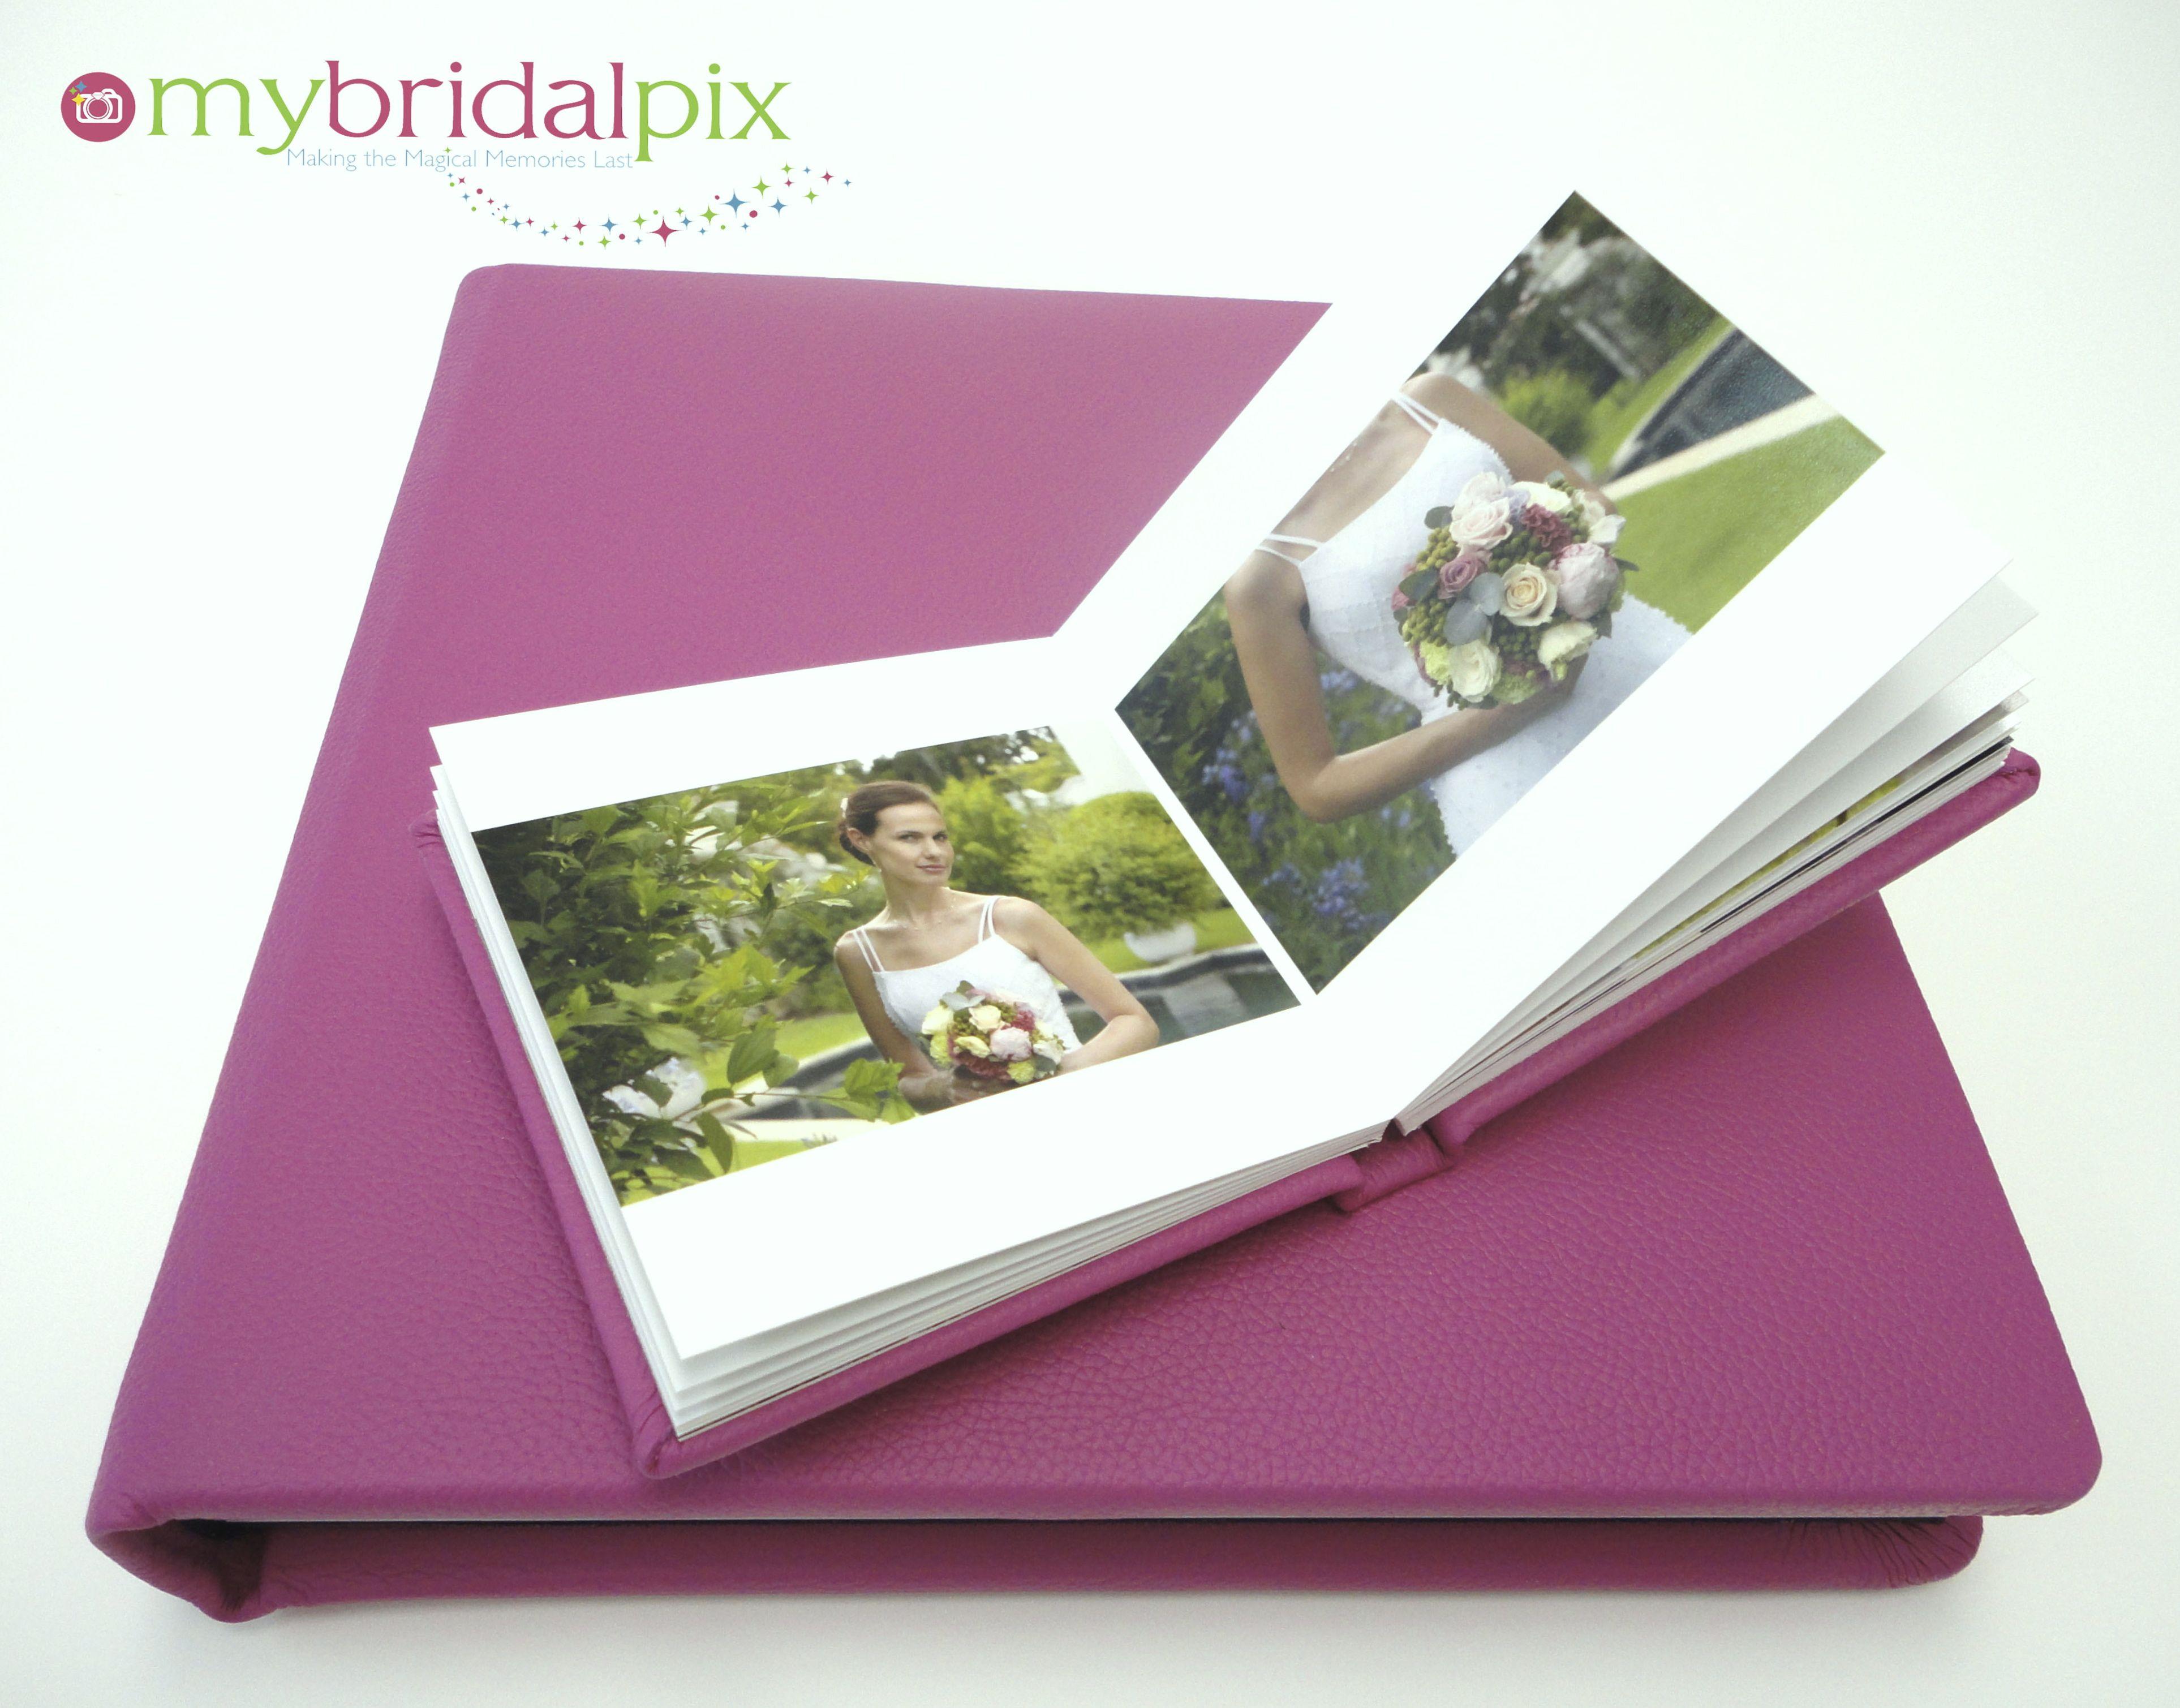 Diy weddingalbums premium quality albums direct to brides